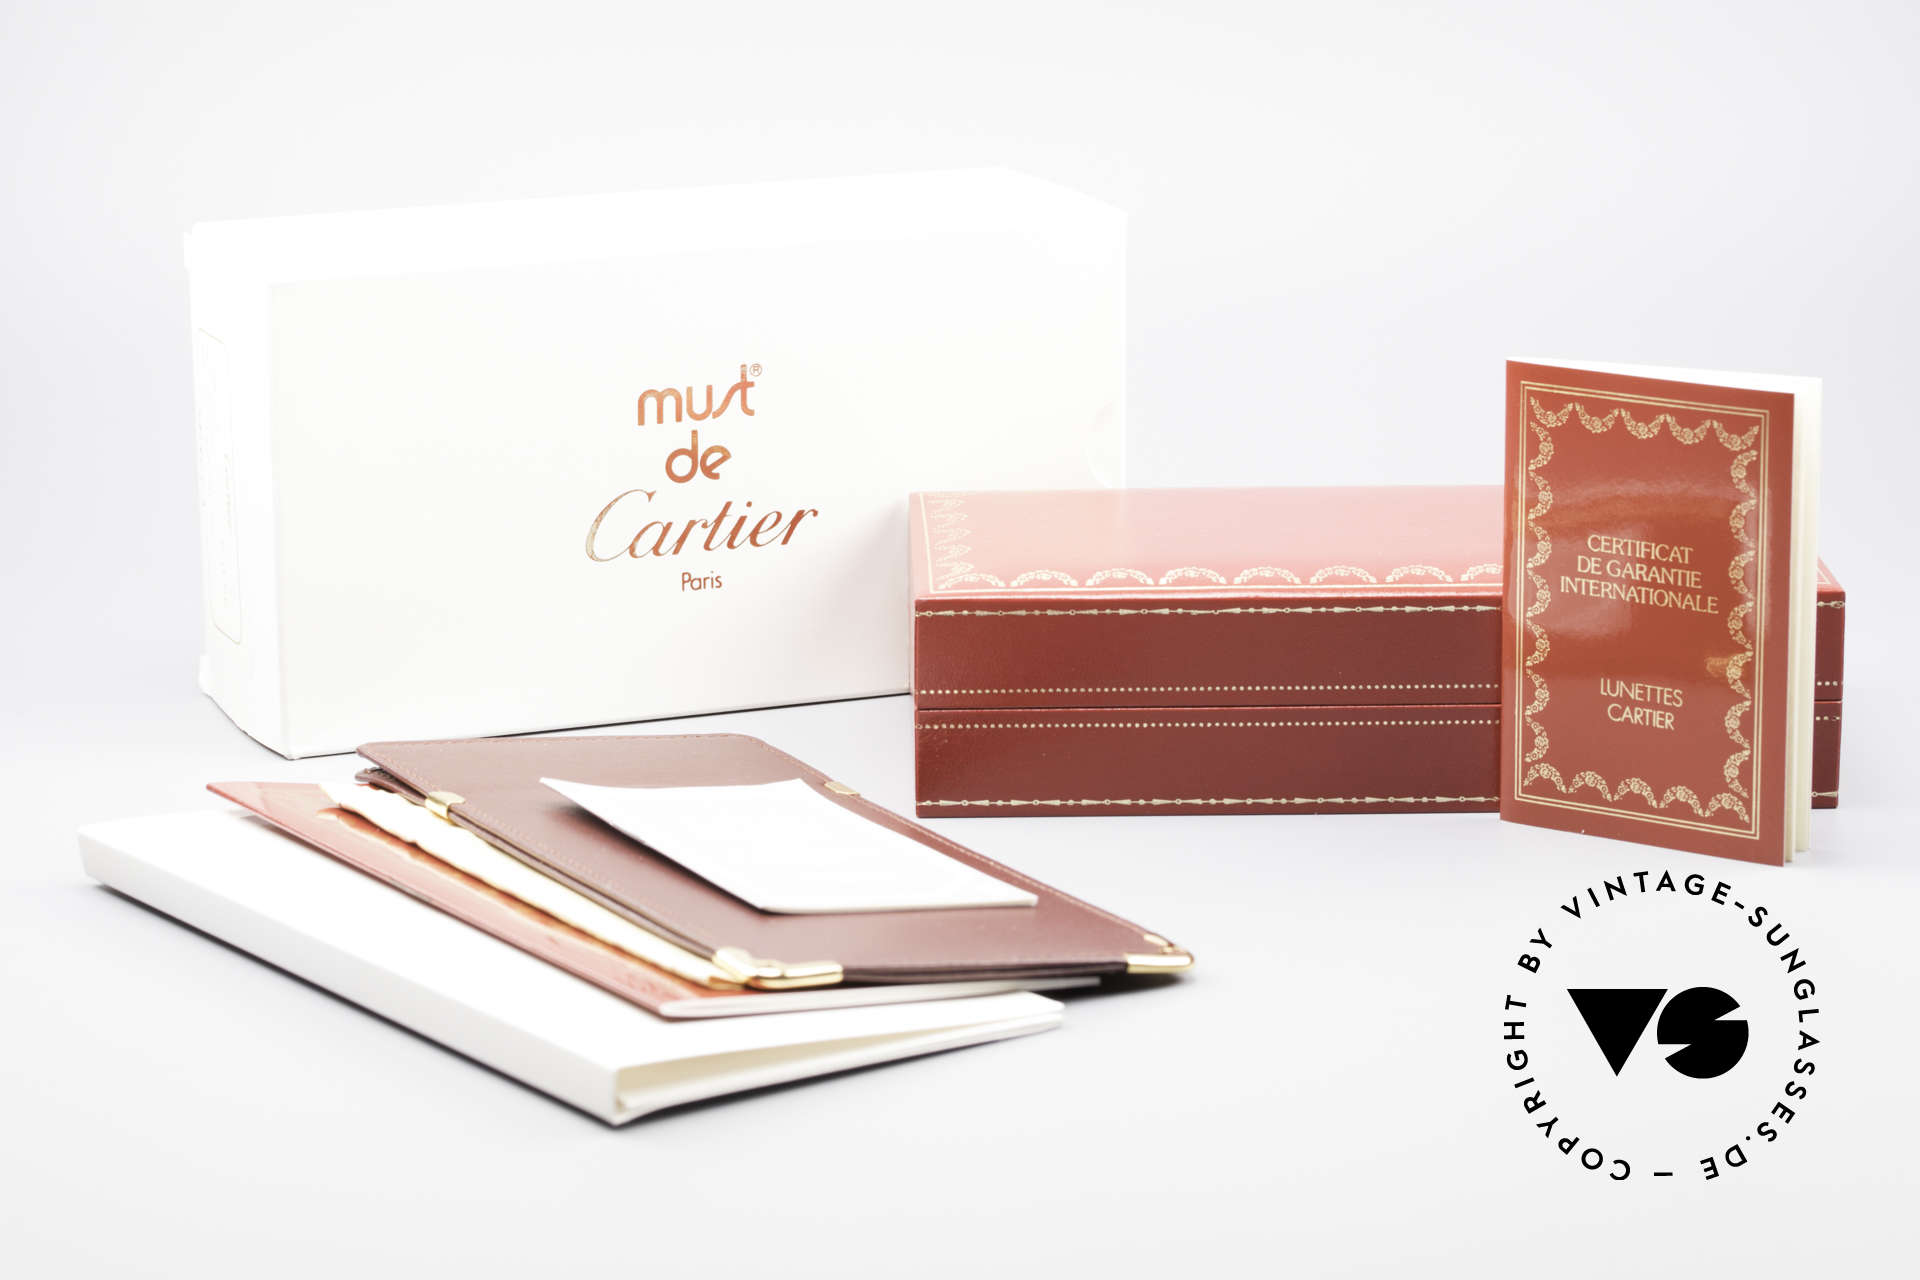 Cartier Vendome LC - M Mystic Cartier Mineral Lenses, Size: medium, Made for Men